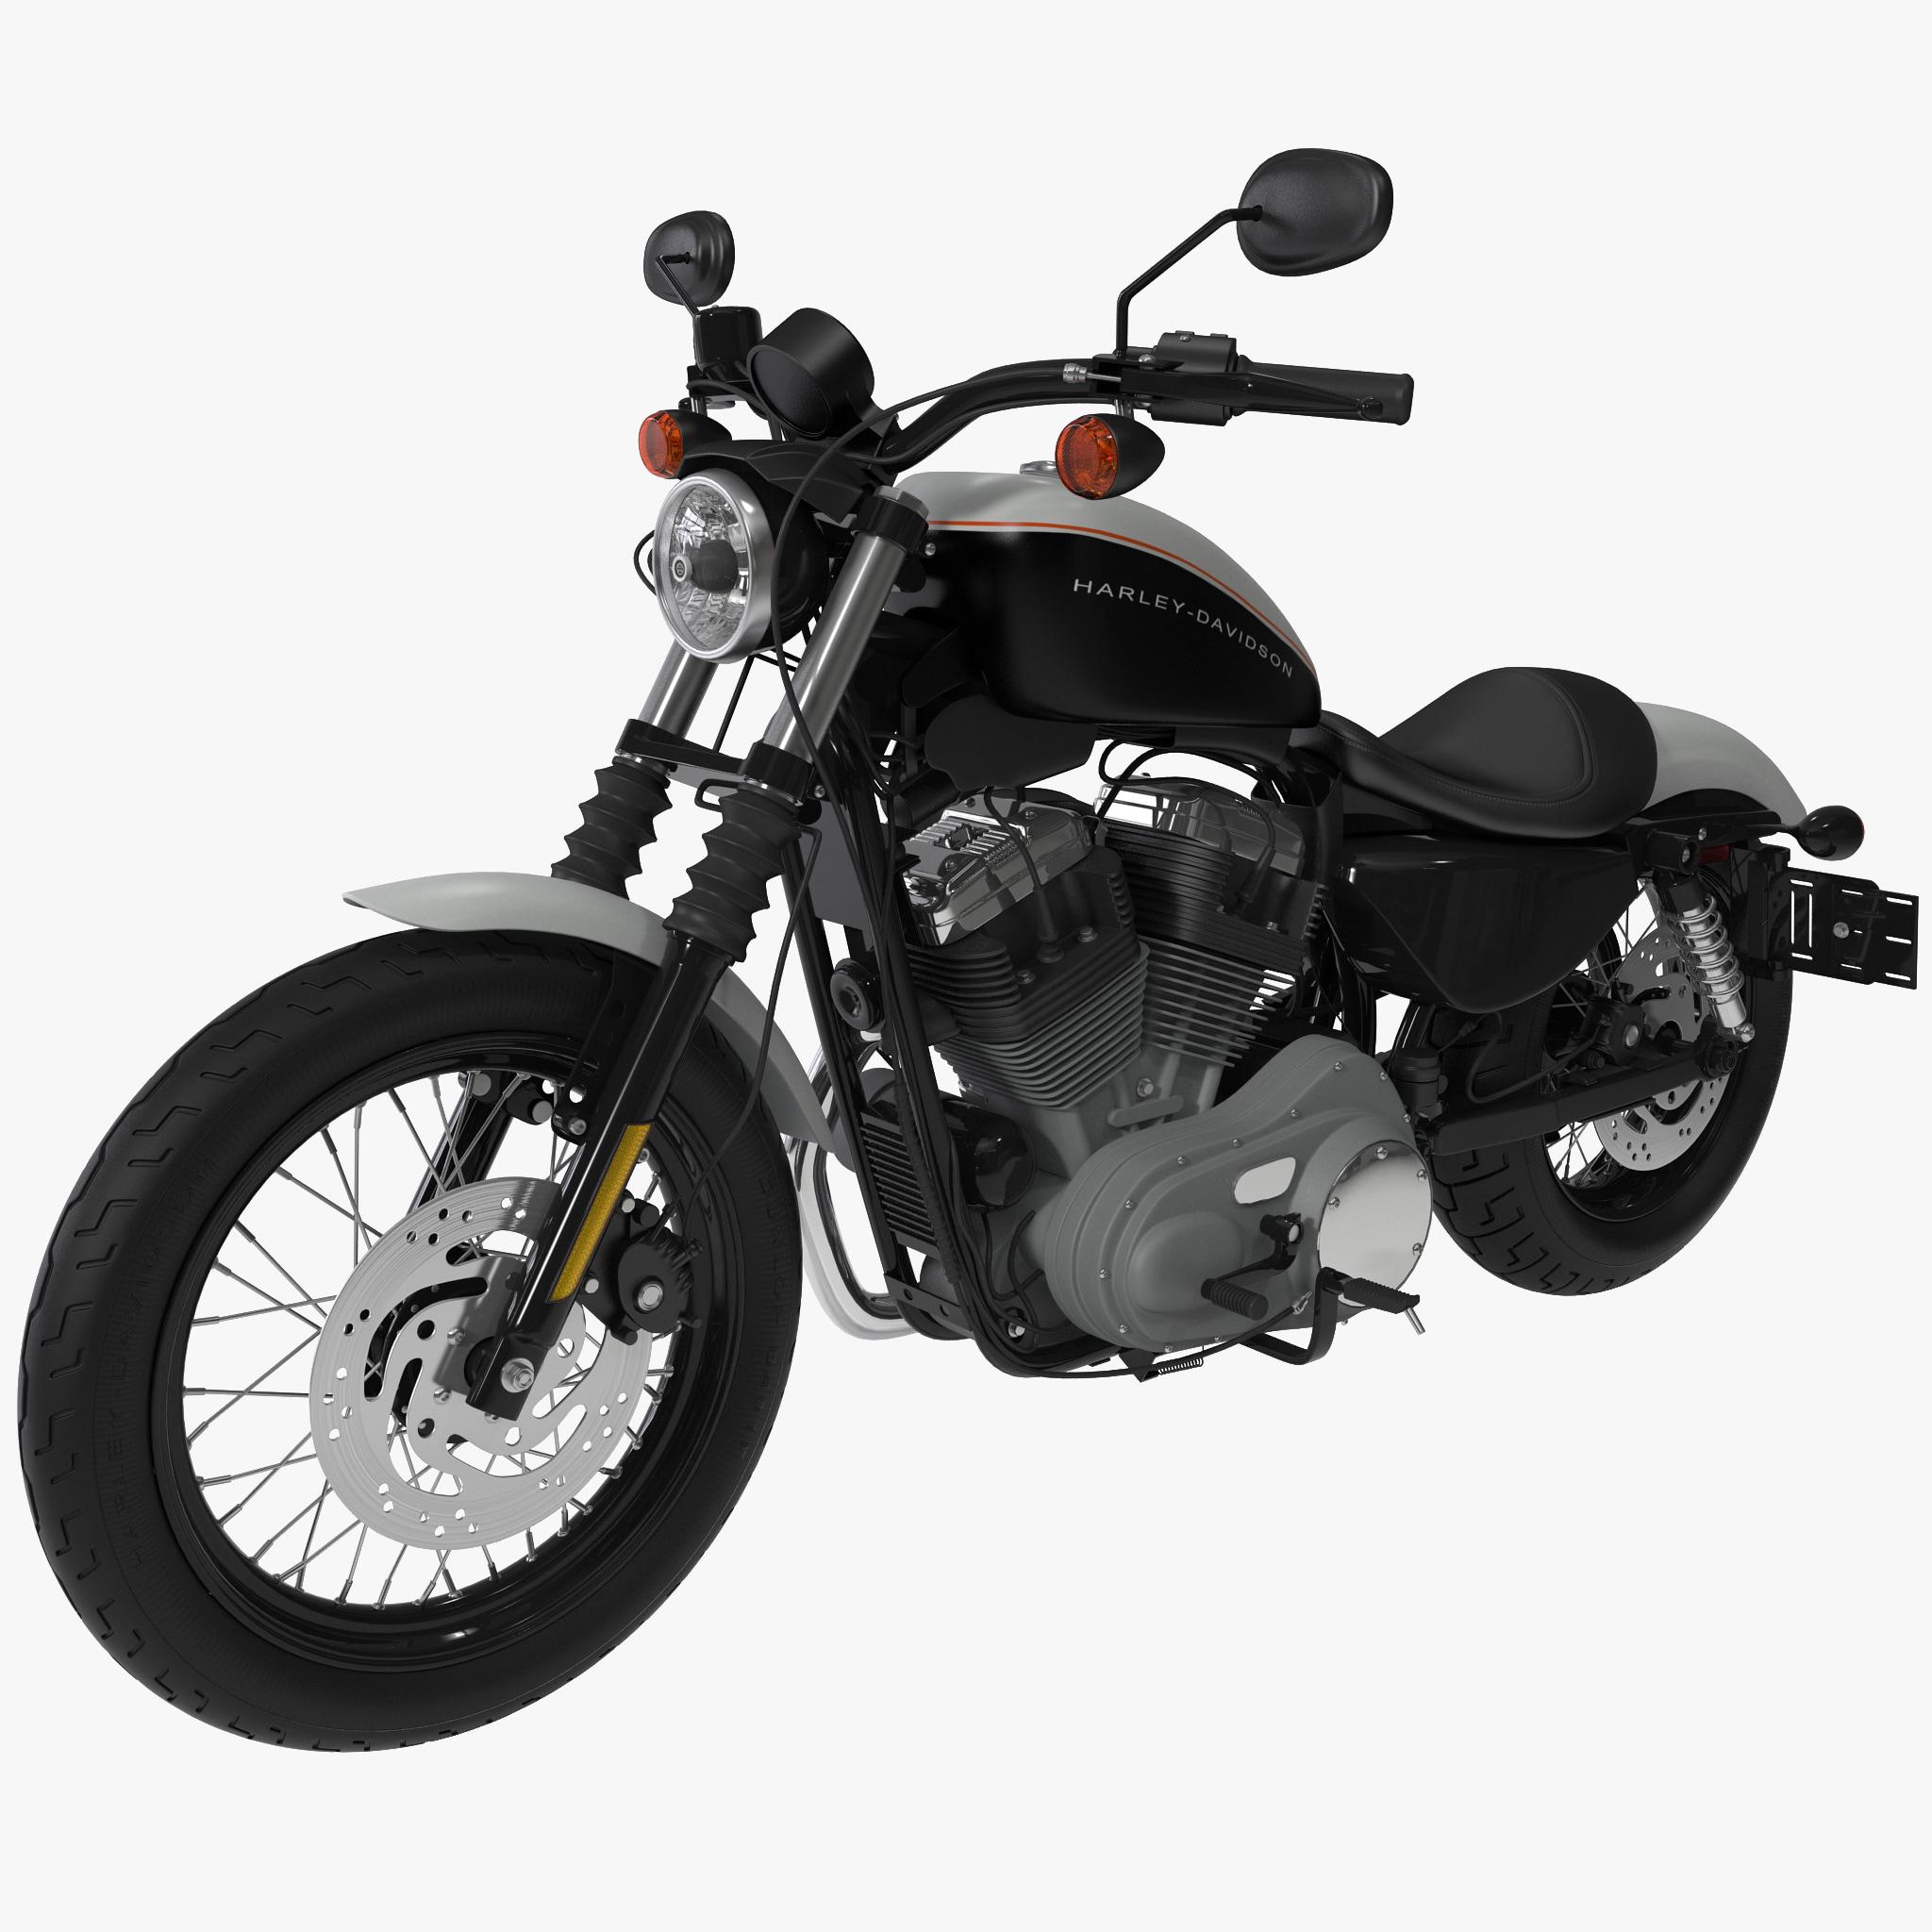 Harley Davidson XL 1200N Nightster_1.jpg